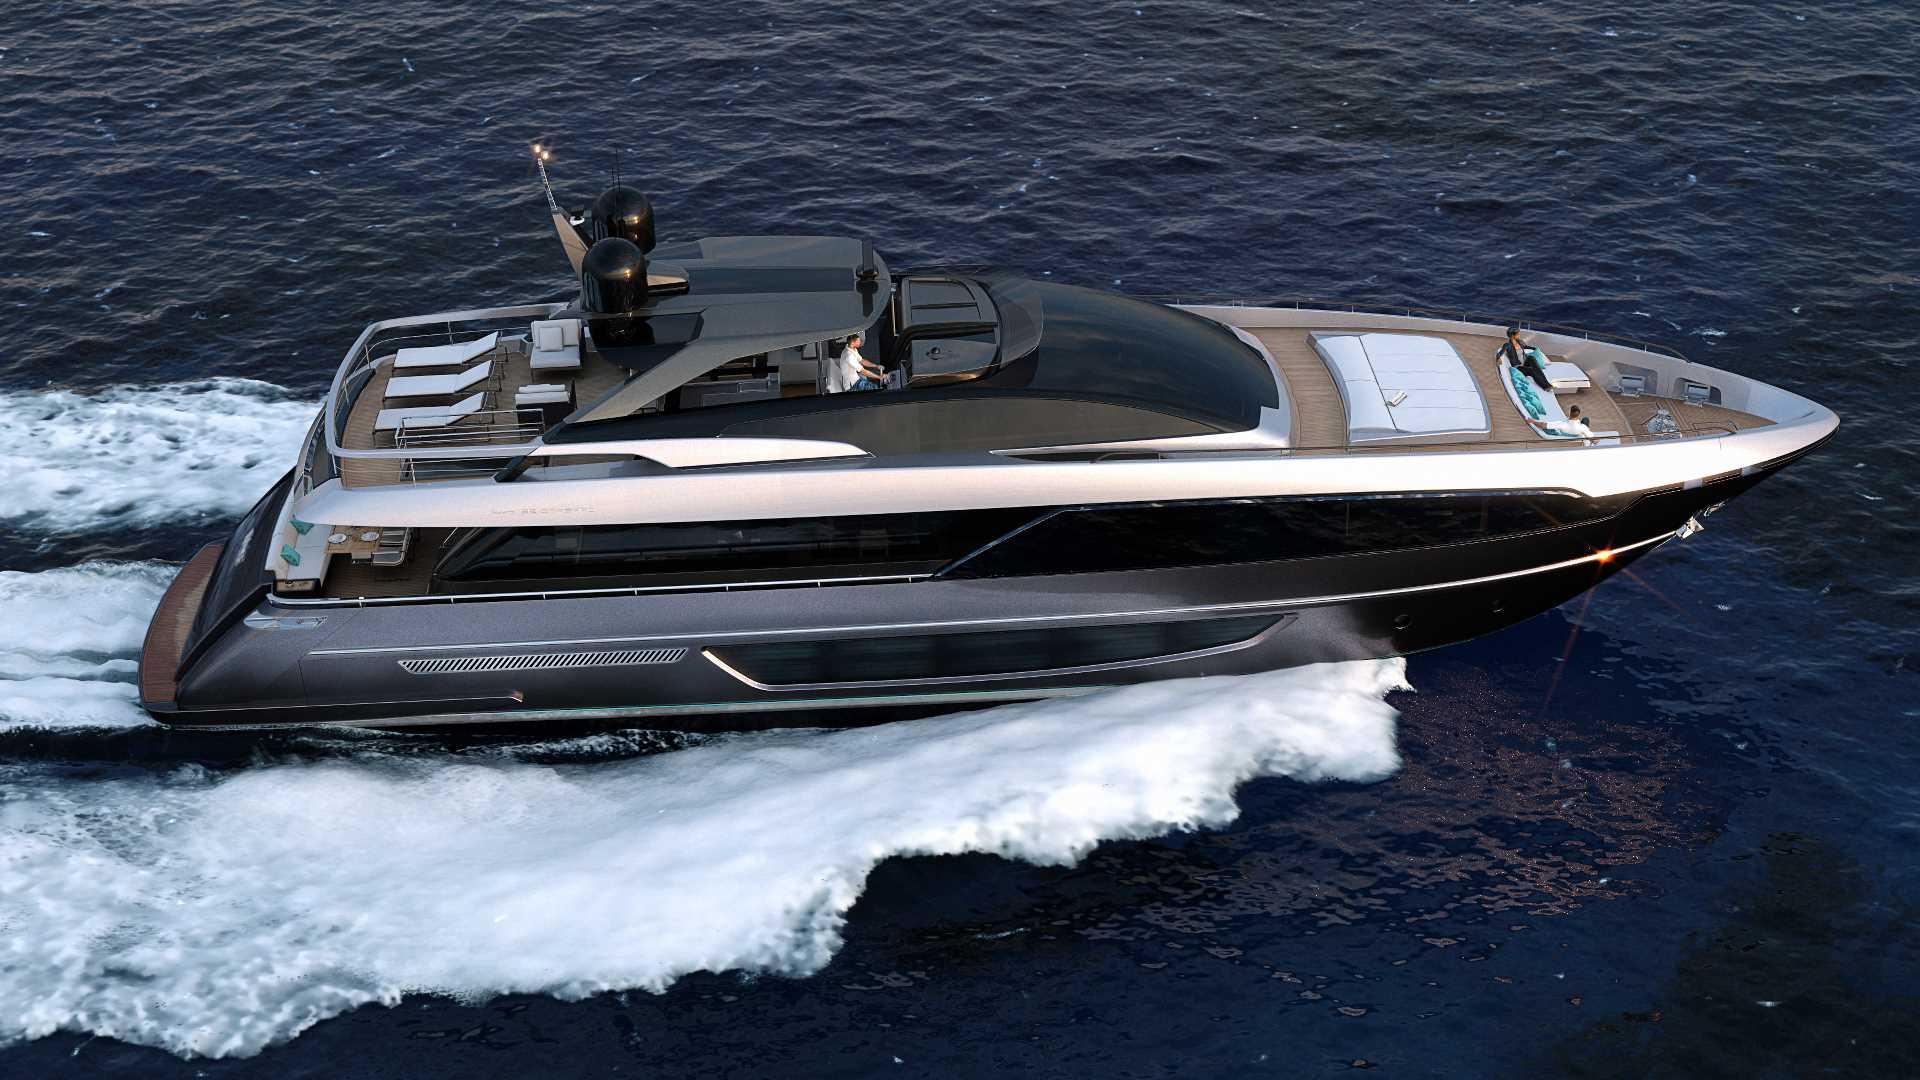 Riva 100' Corsaro: a new era for the Riva flybridge.  The maxi yacht is under construction at the La Spezia shipyard image